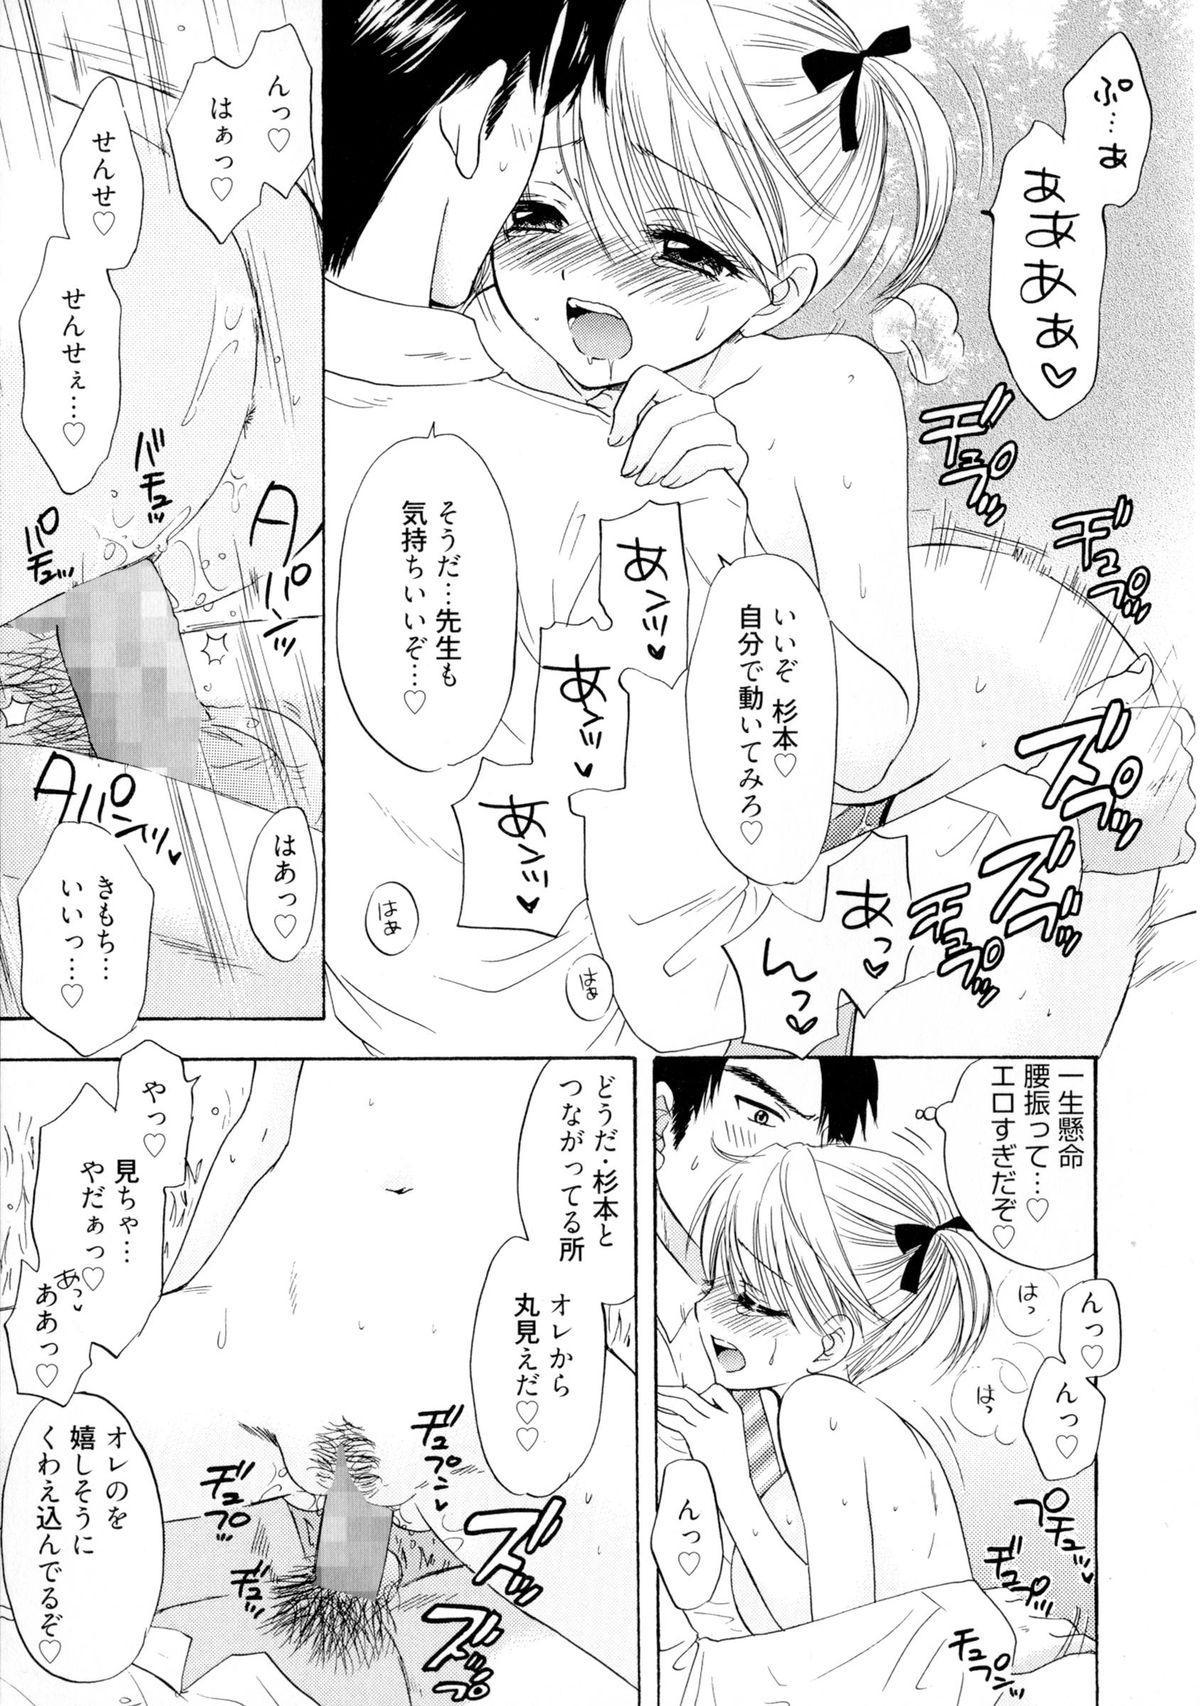 The Great Escape 4 Shokai Genteiban 16